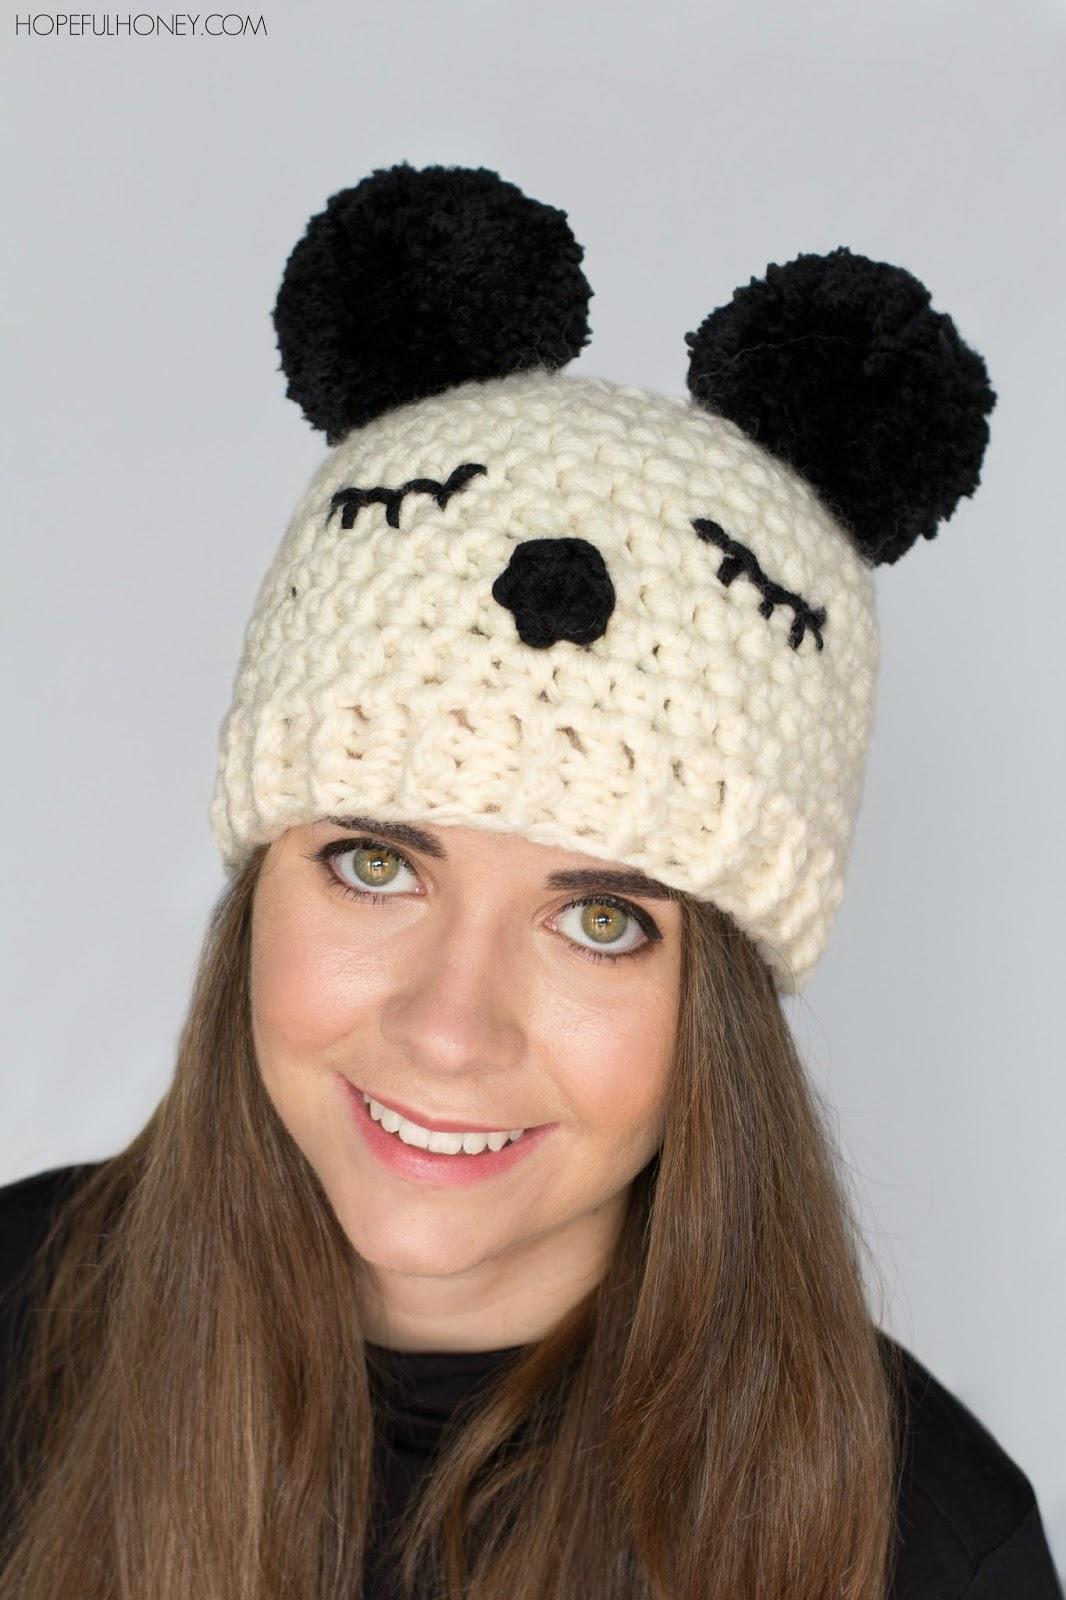 Hopeful Honey Craft, Crochet, Create: Panda Pompom Hat ...